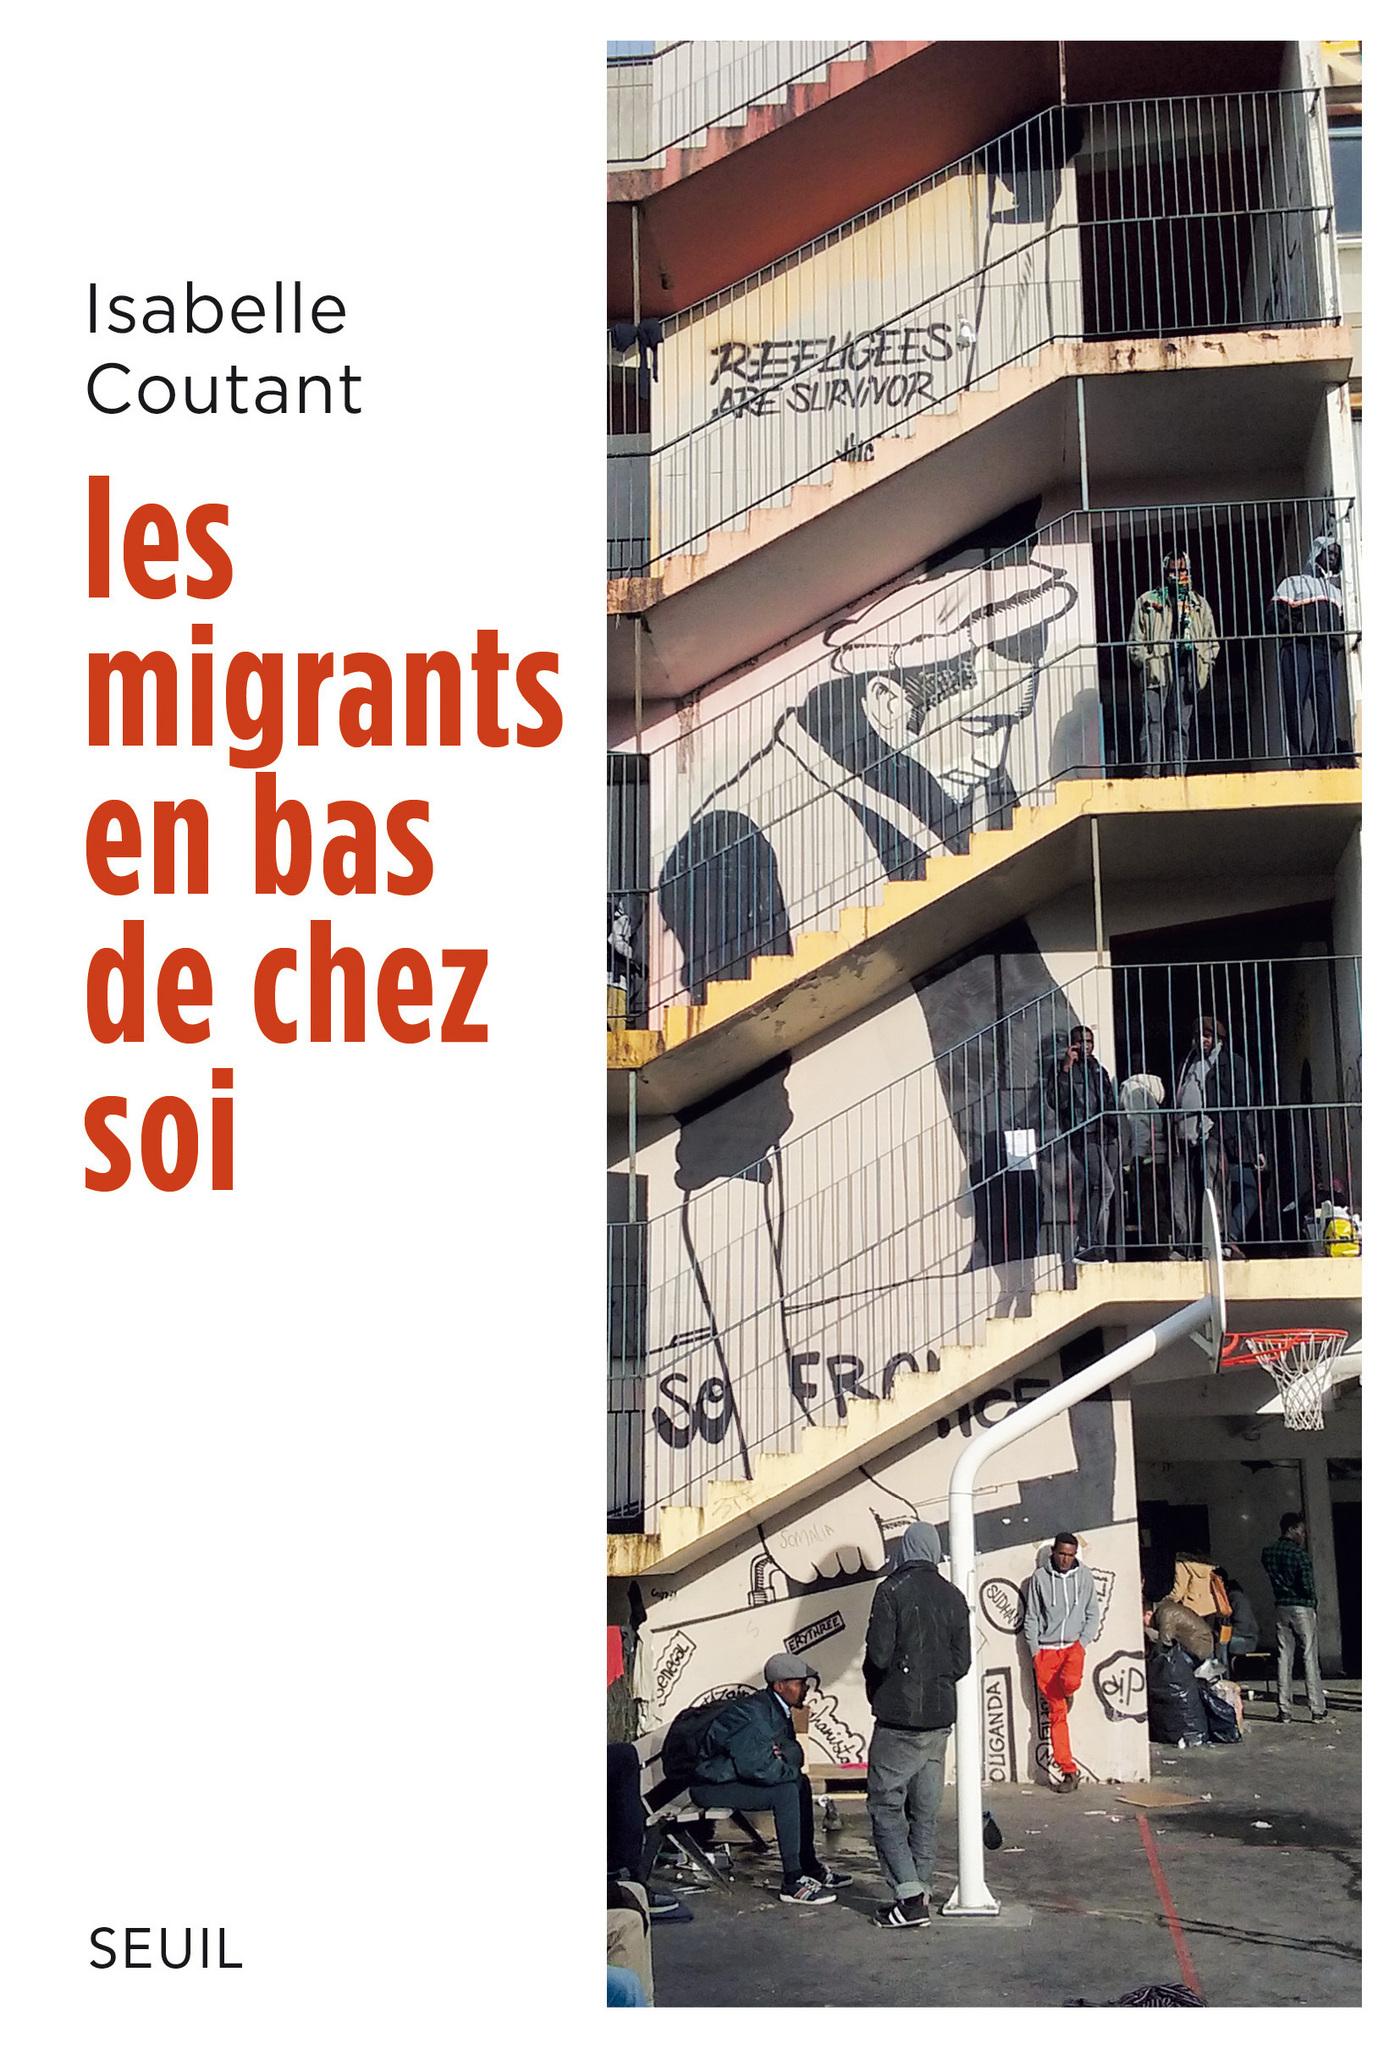 Les migrants en bas de chez soi